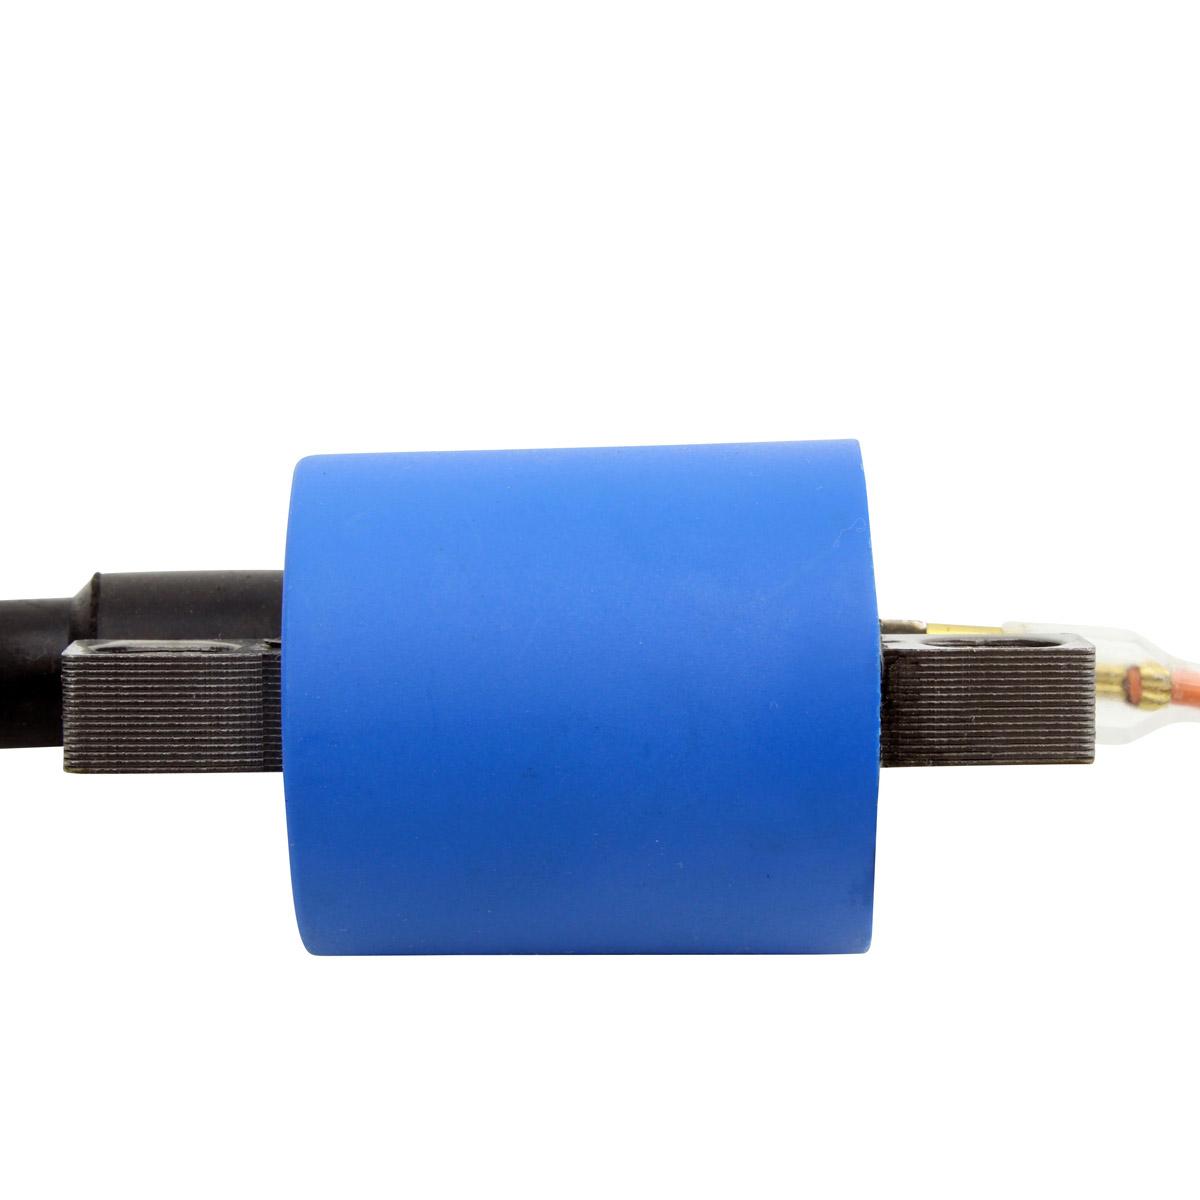 External Ignition Coil For Yamaha ATV OEM Repl.# 3YL-82310-00-00 3YL-82320-01-00